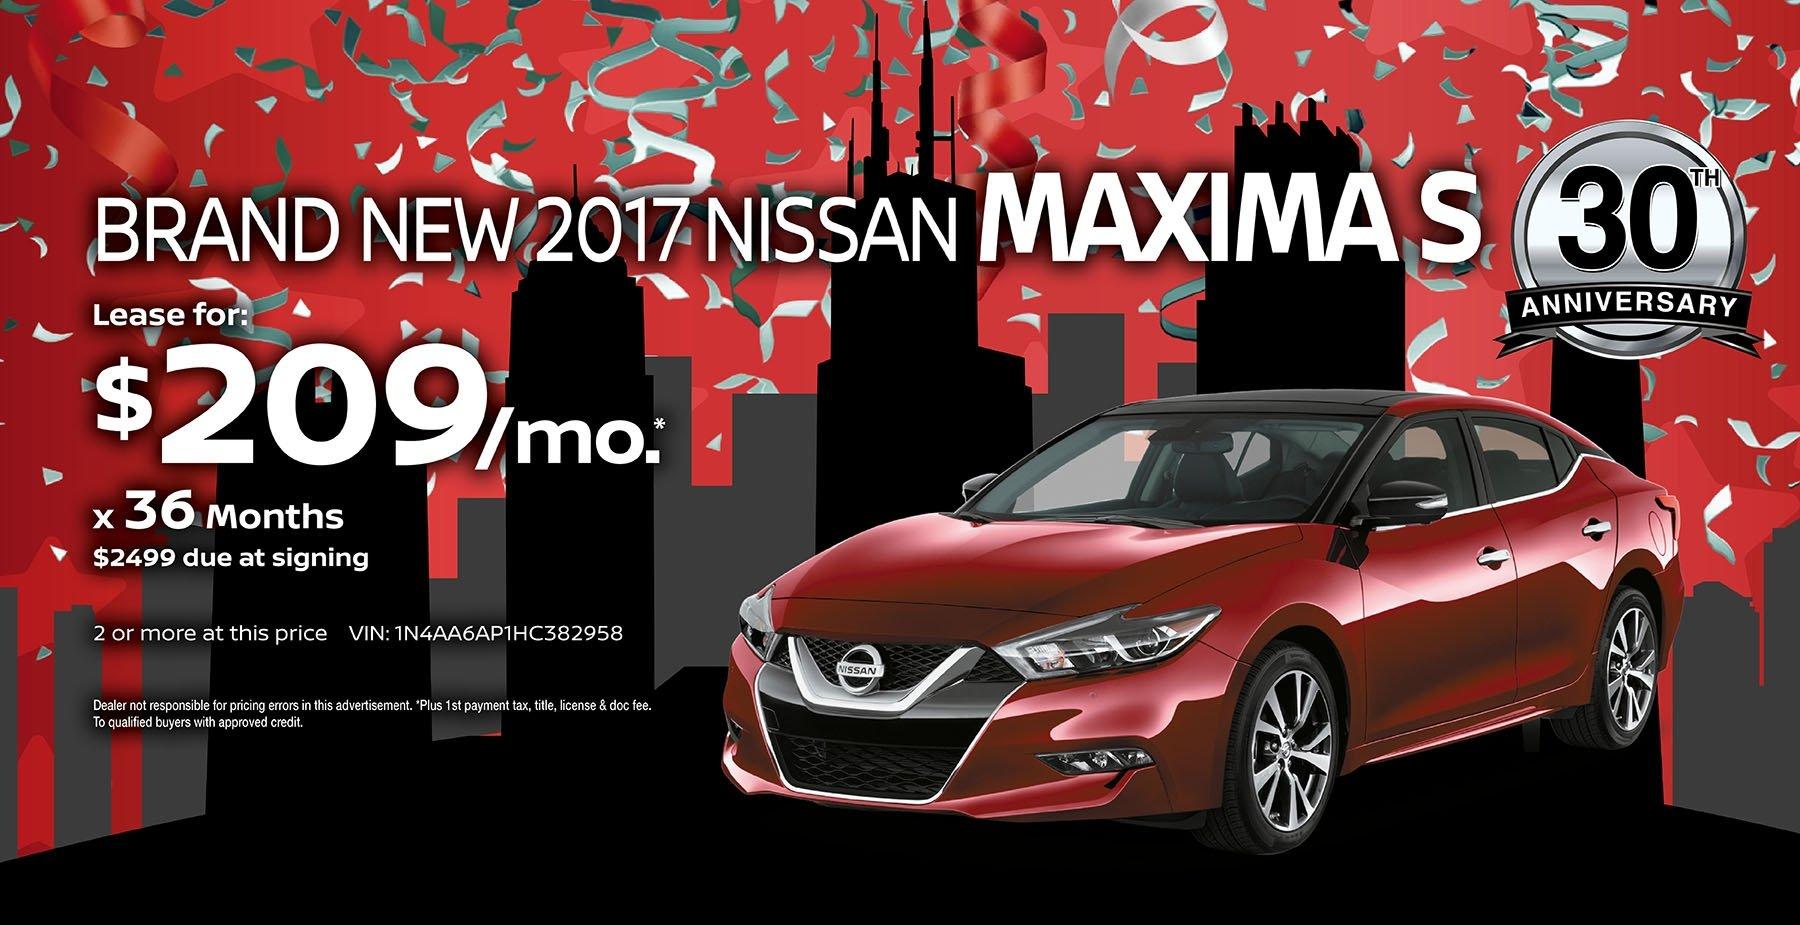 2017 Nissan Maxima June Sale at Star Nissan